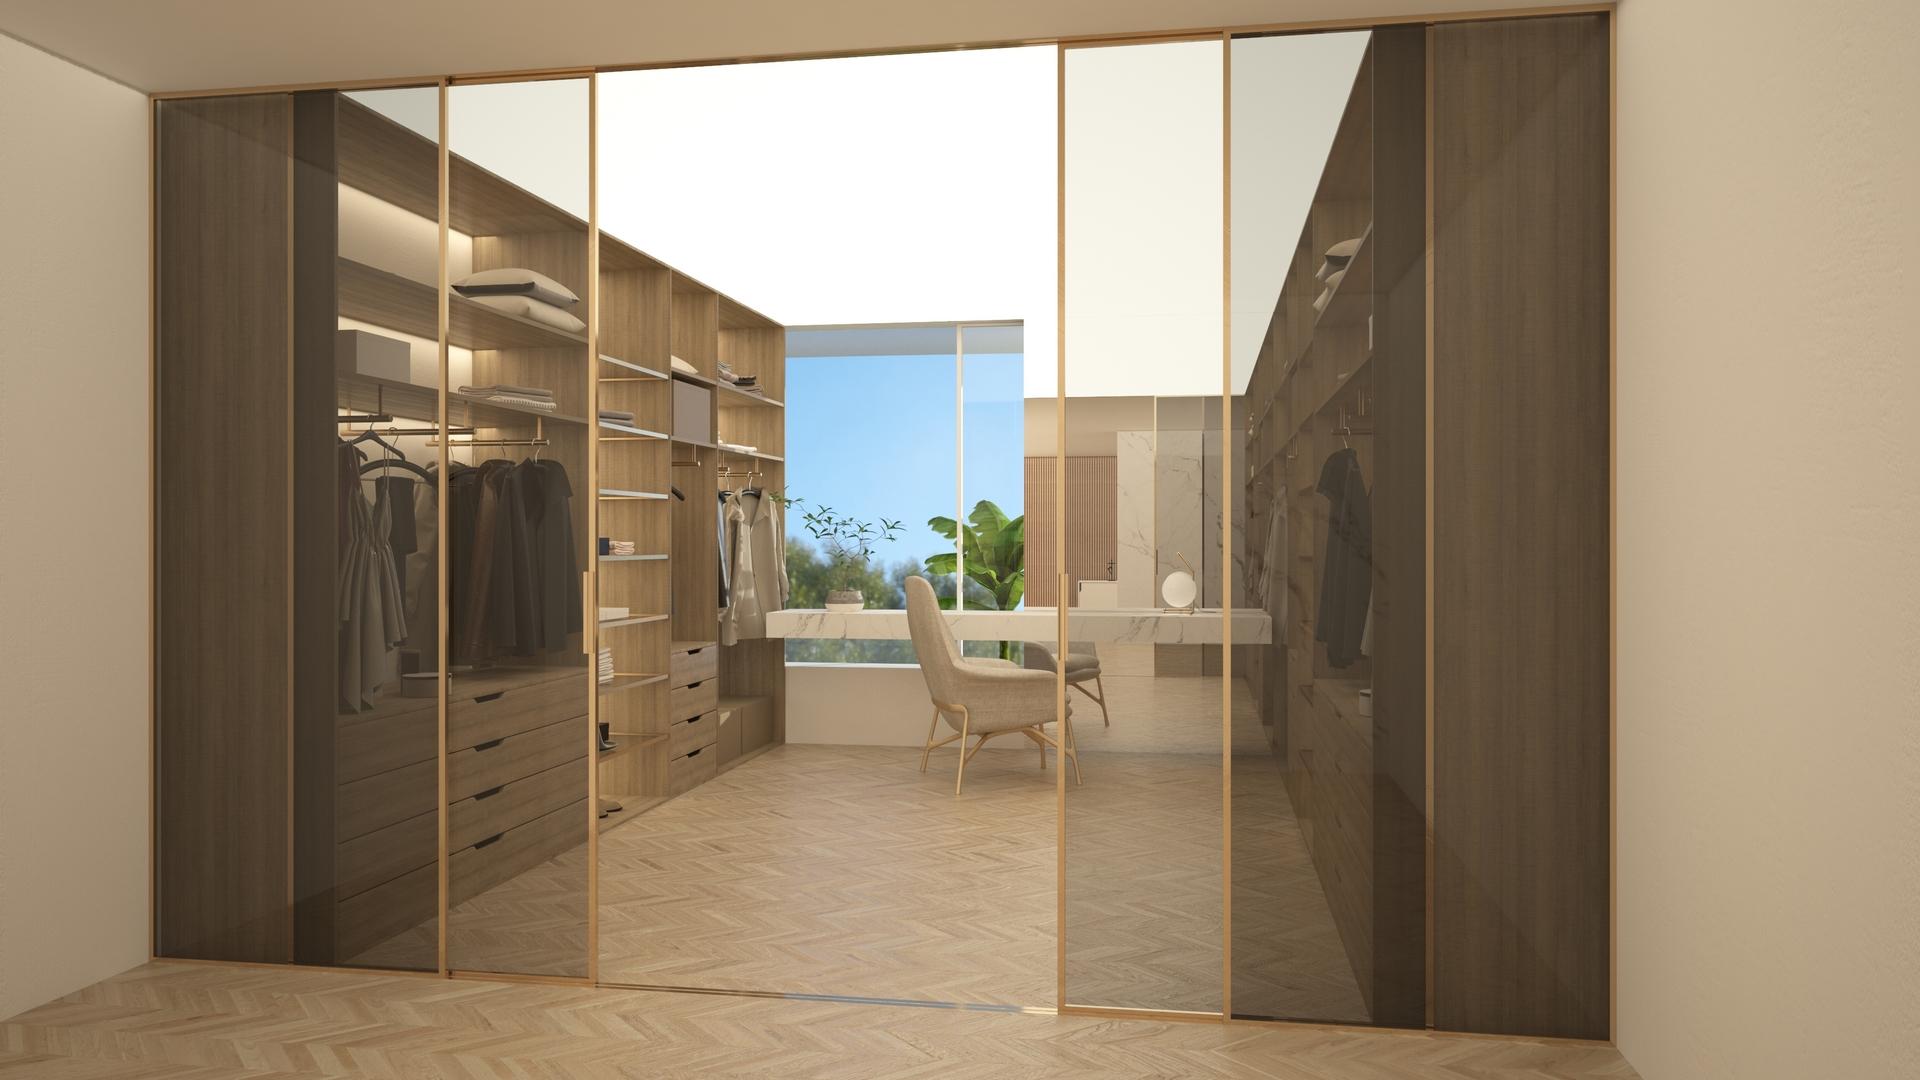 Penthouse - walk in closet (Αντιγραφή)